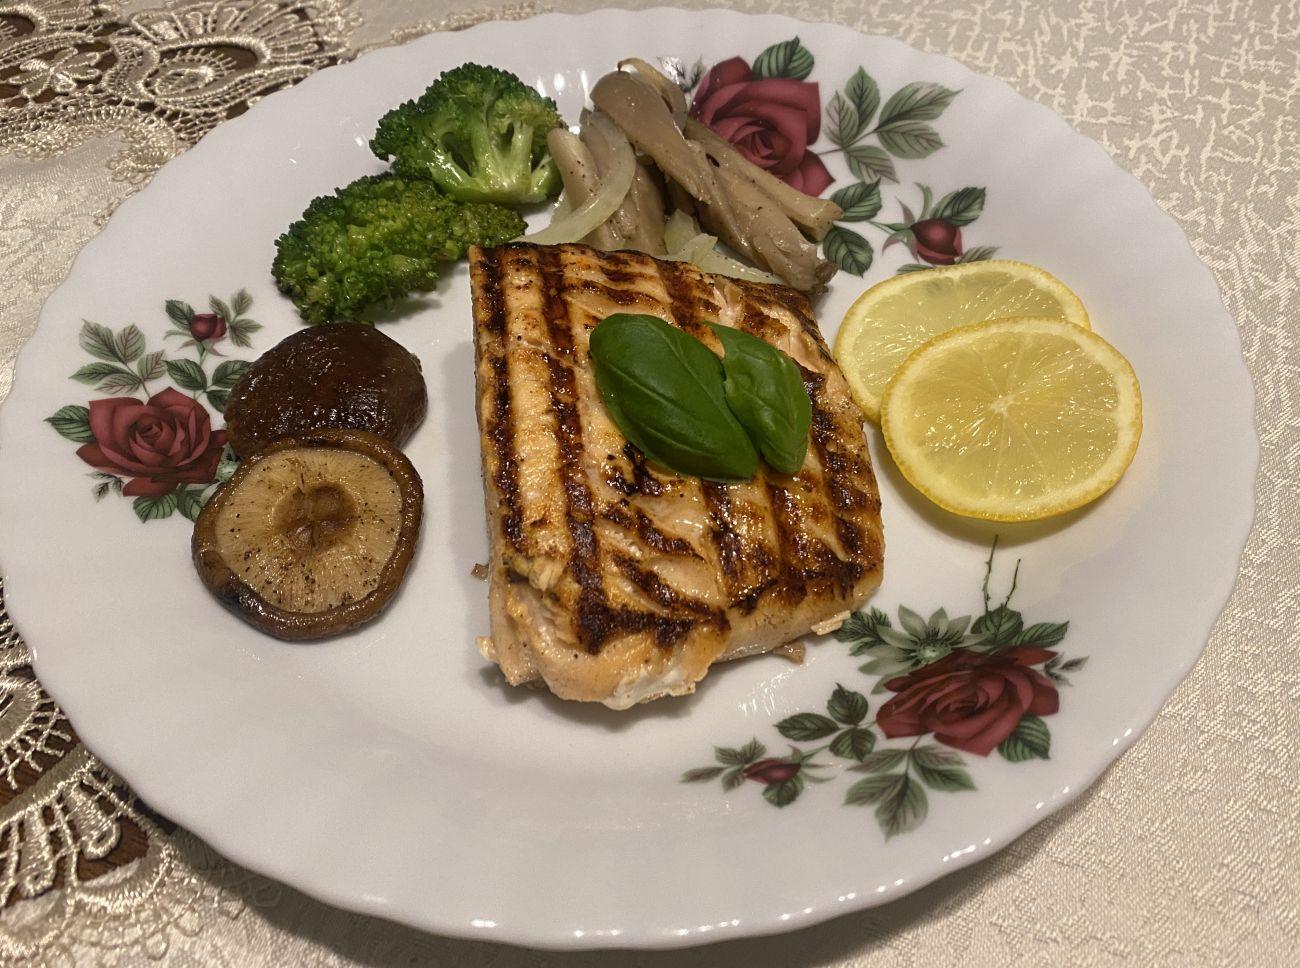 Stek z łososia podany na talerzu